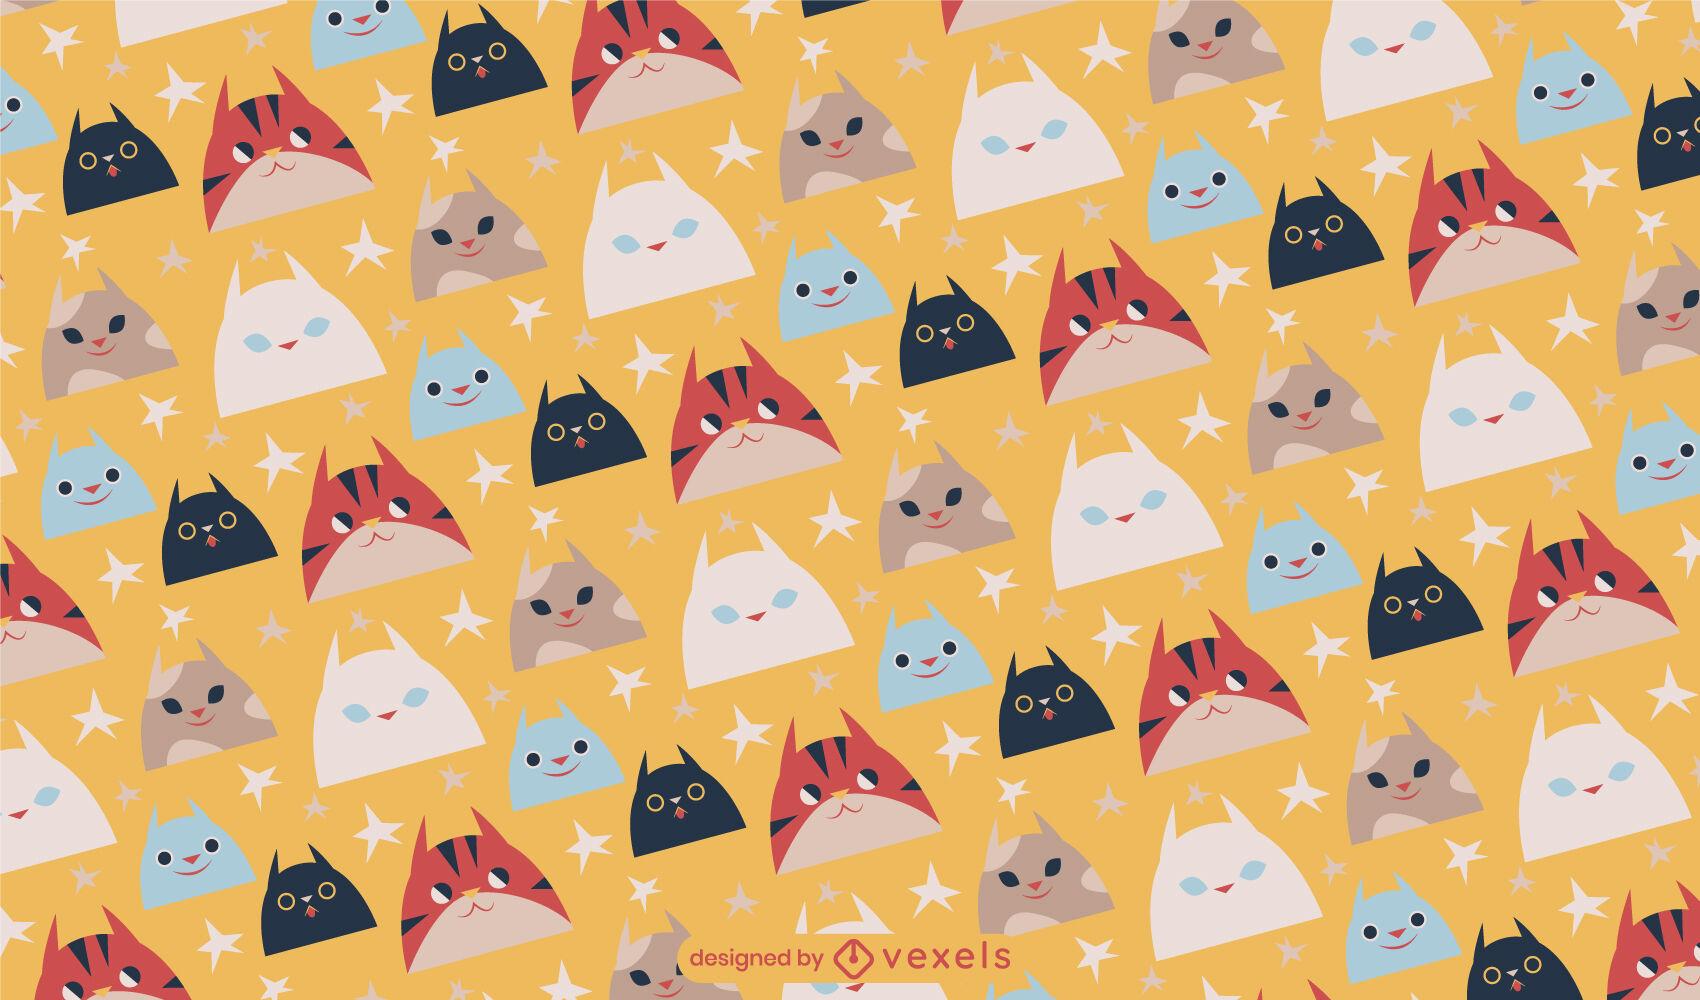 Cute cat heads animal pattern design